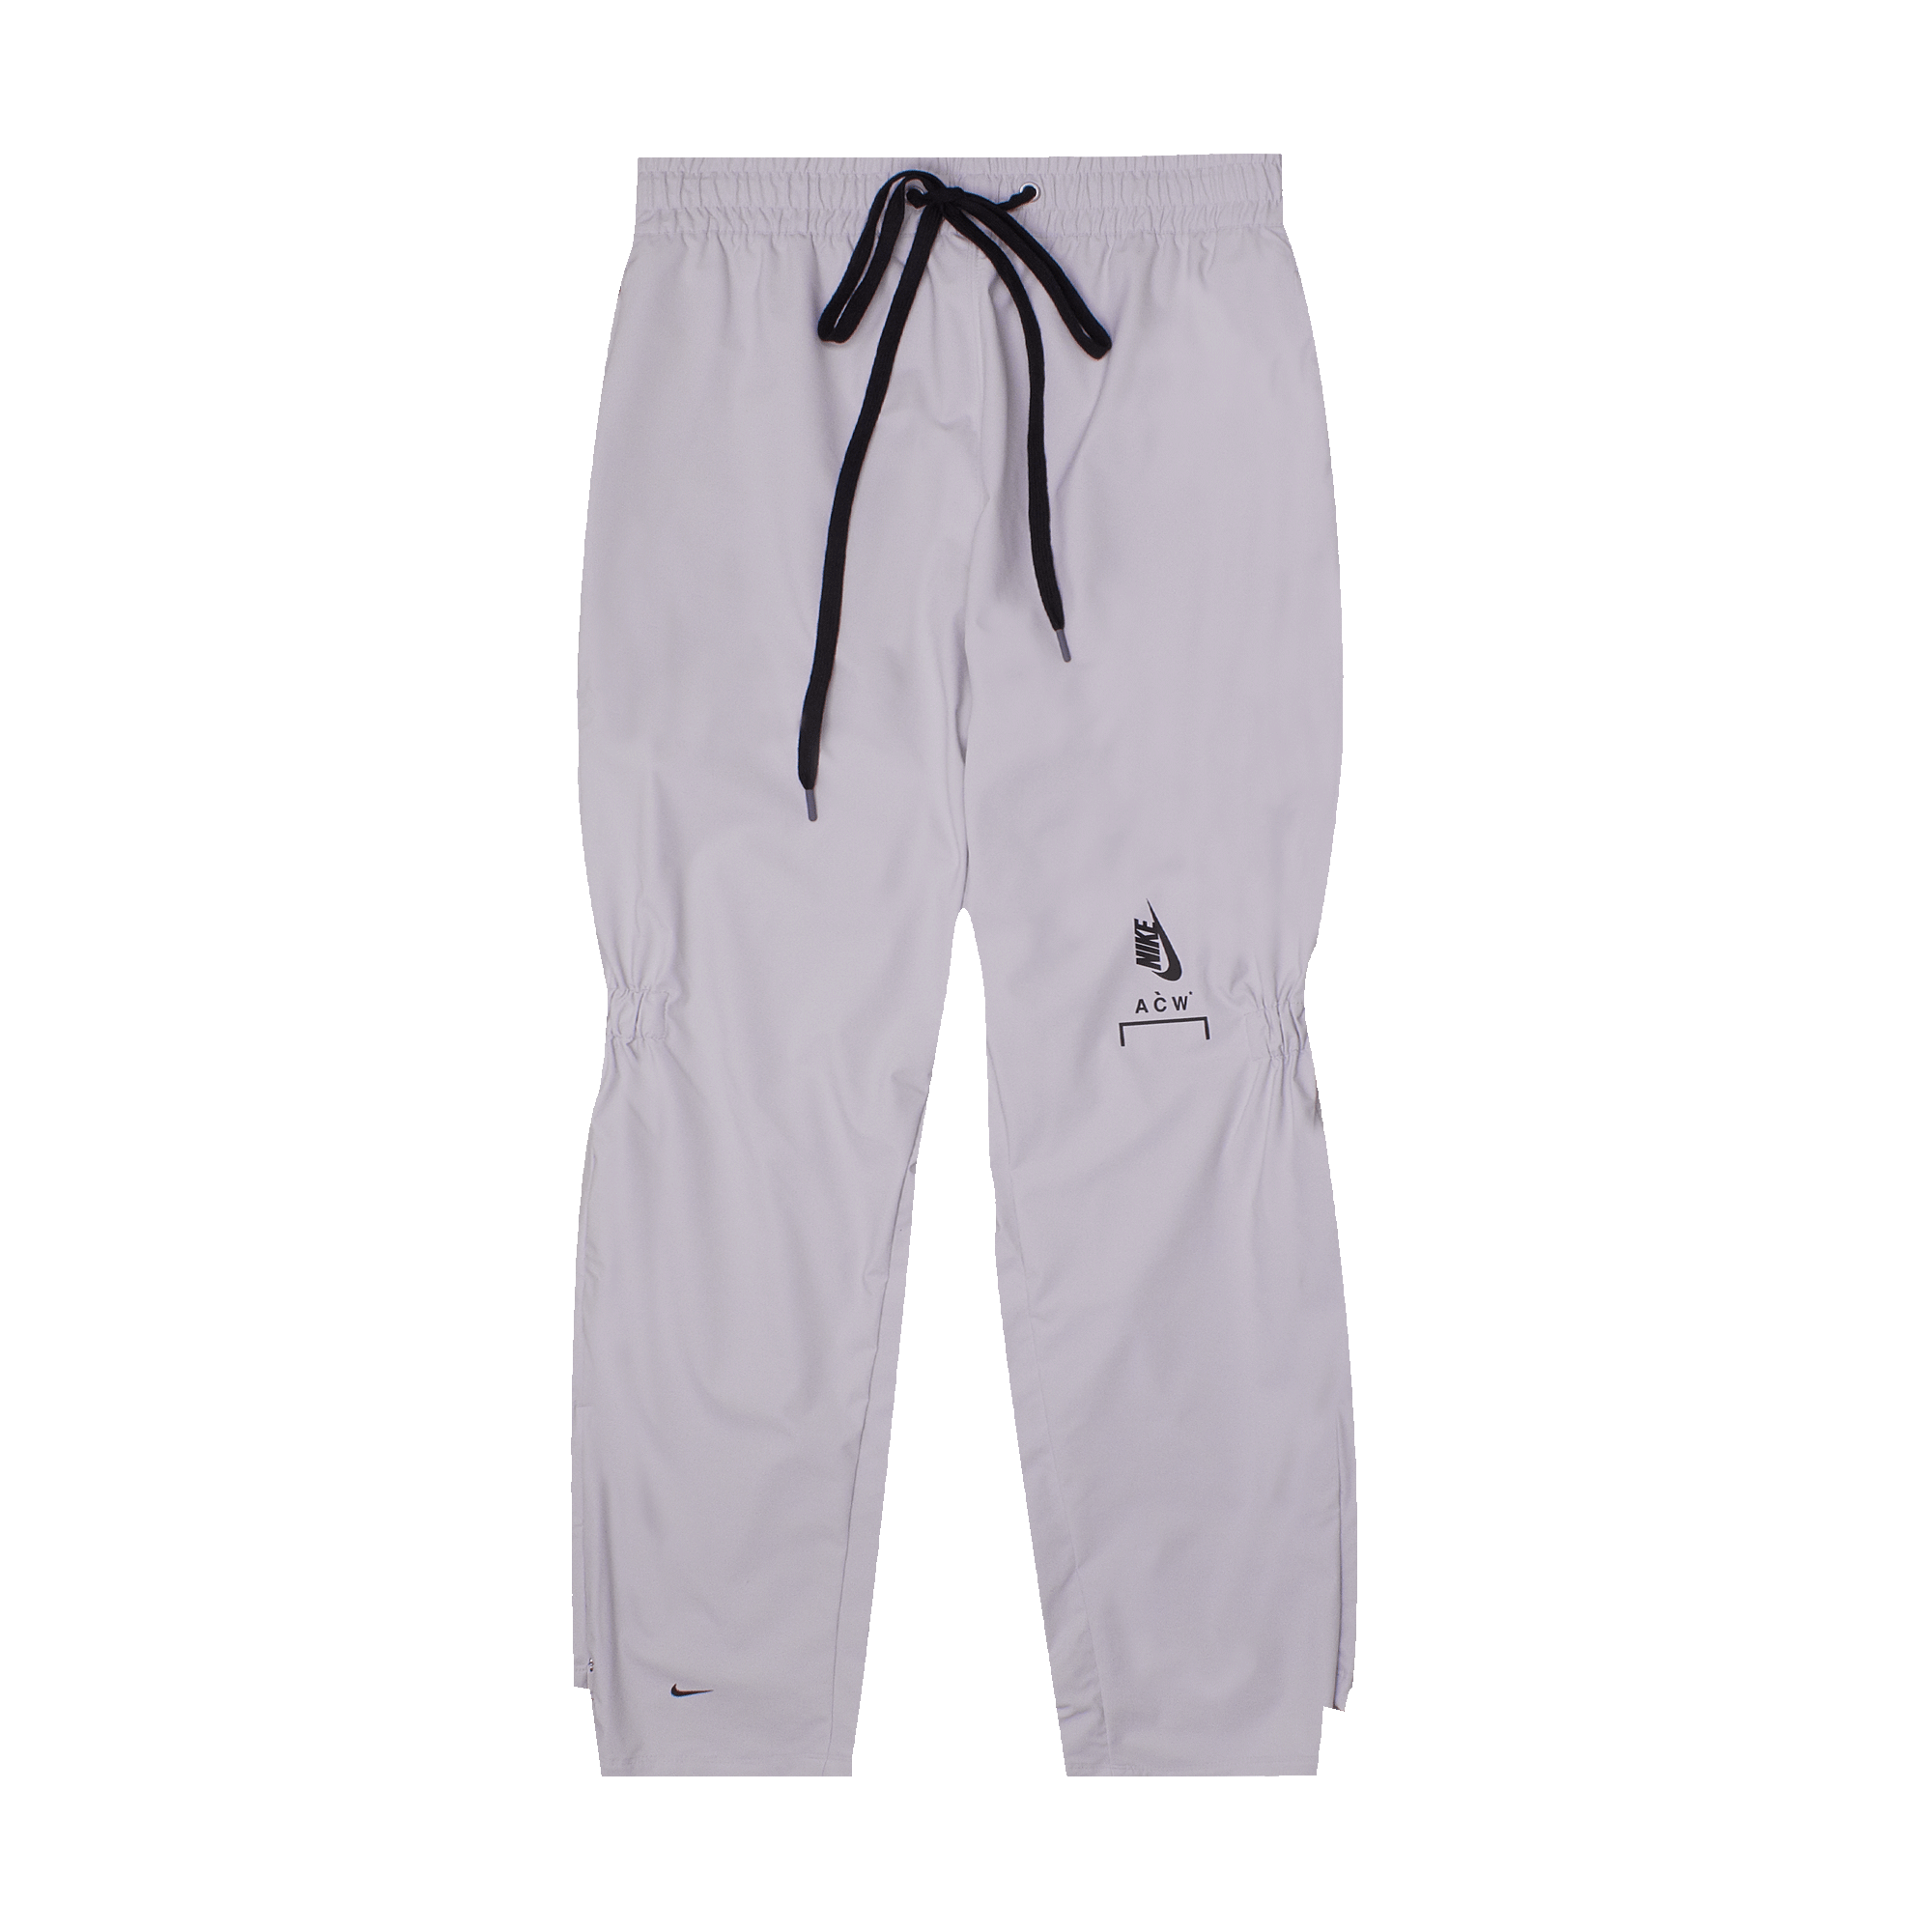 Pantaloni in maglia Nike Sportswear Tech Pack Uomo. Nike CH